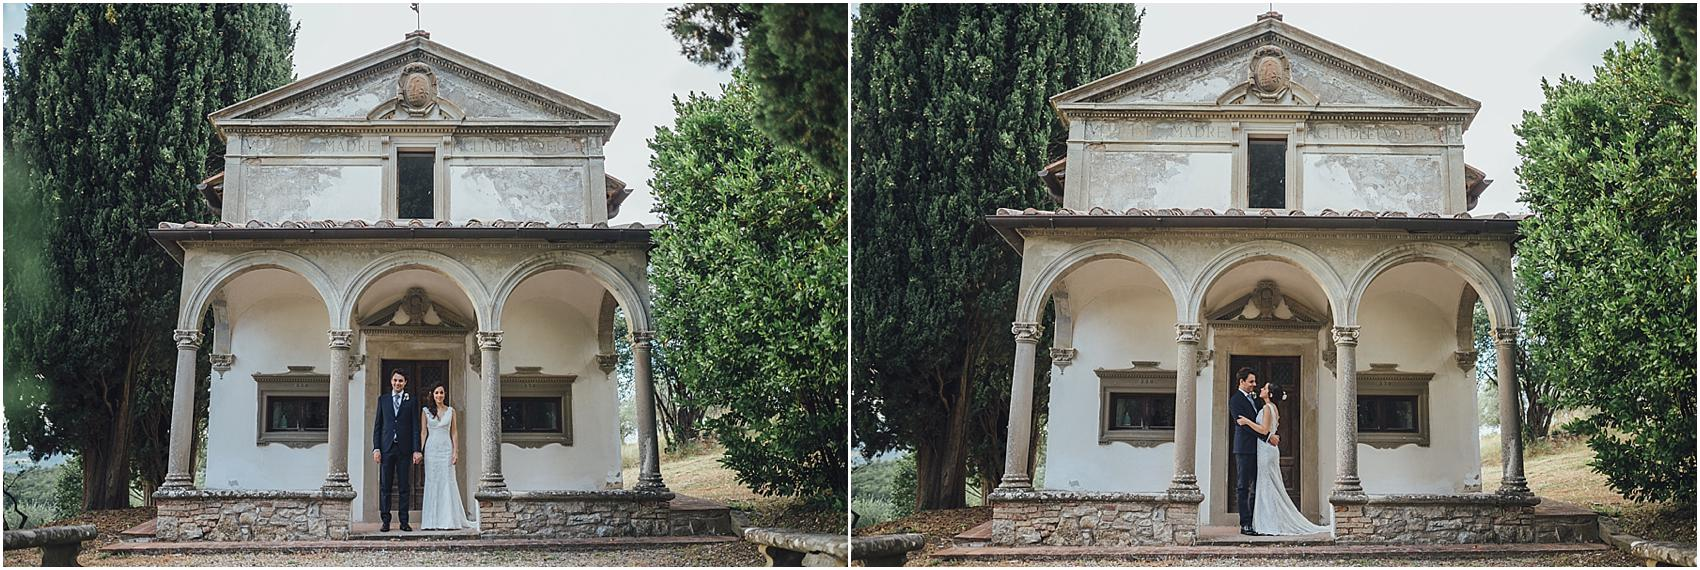 destination-wedding-photographer-tuscany_0160